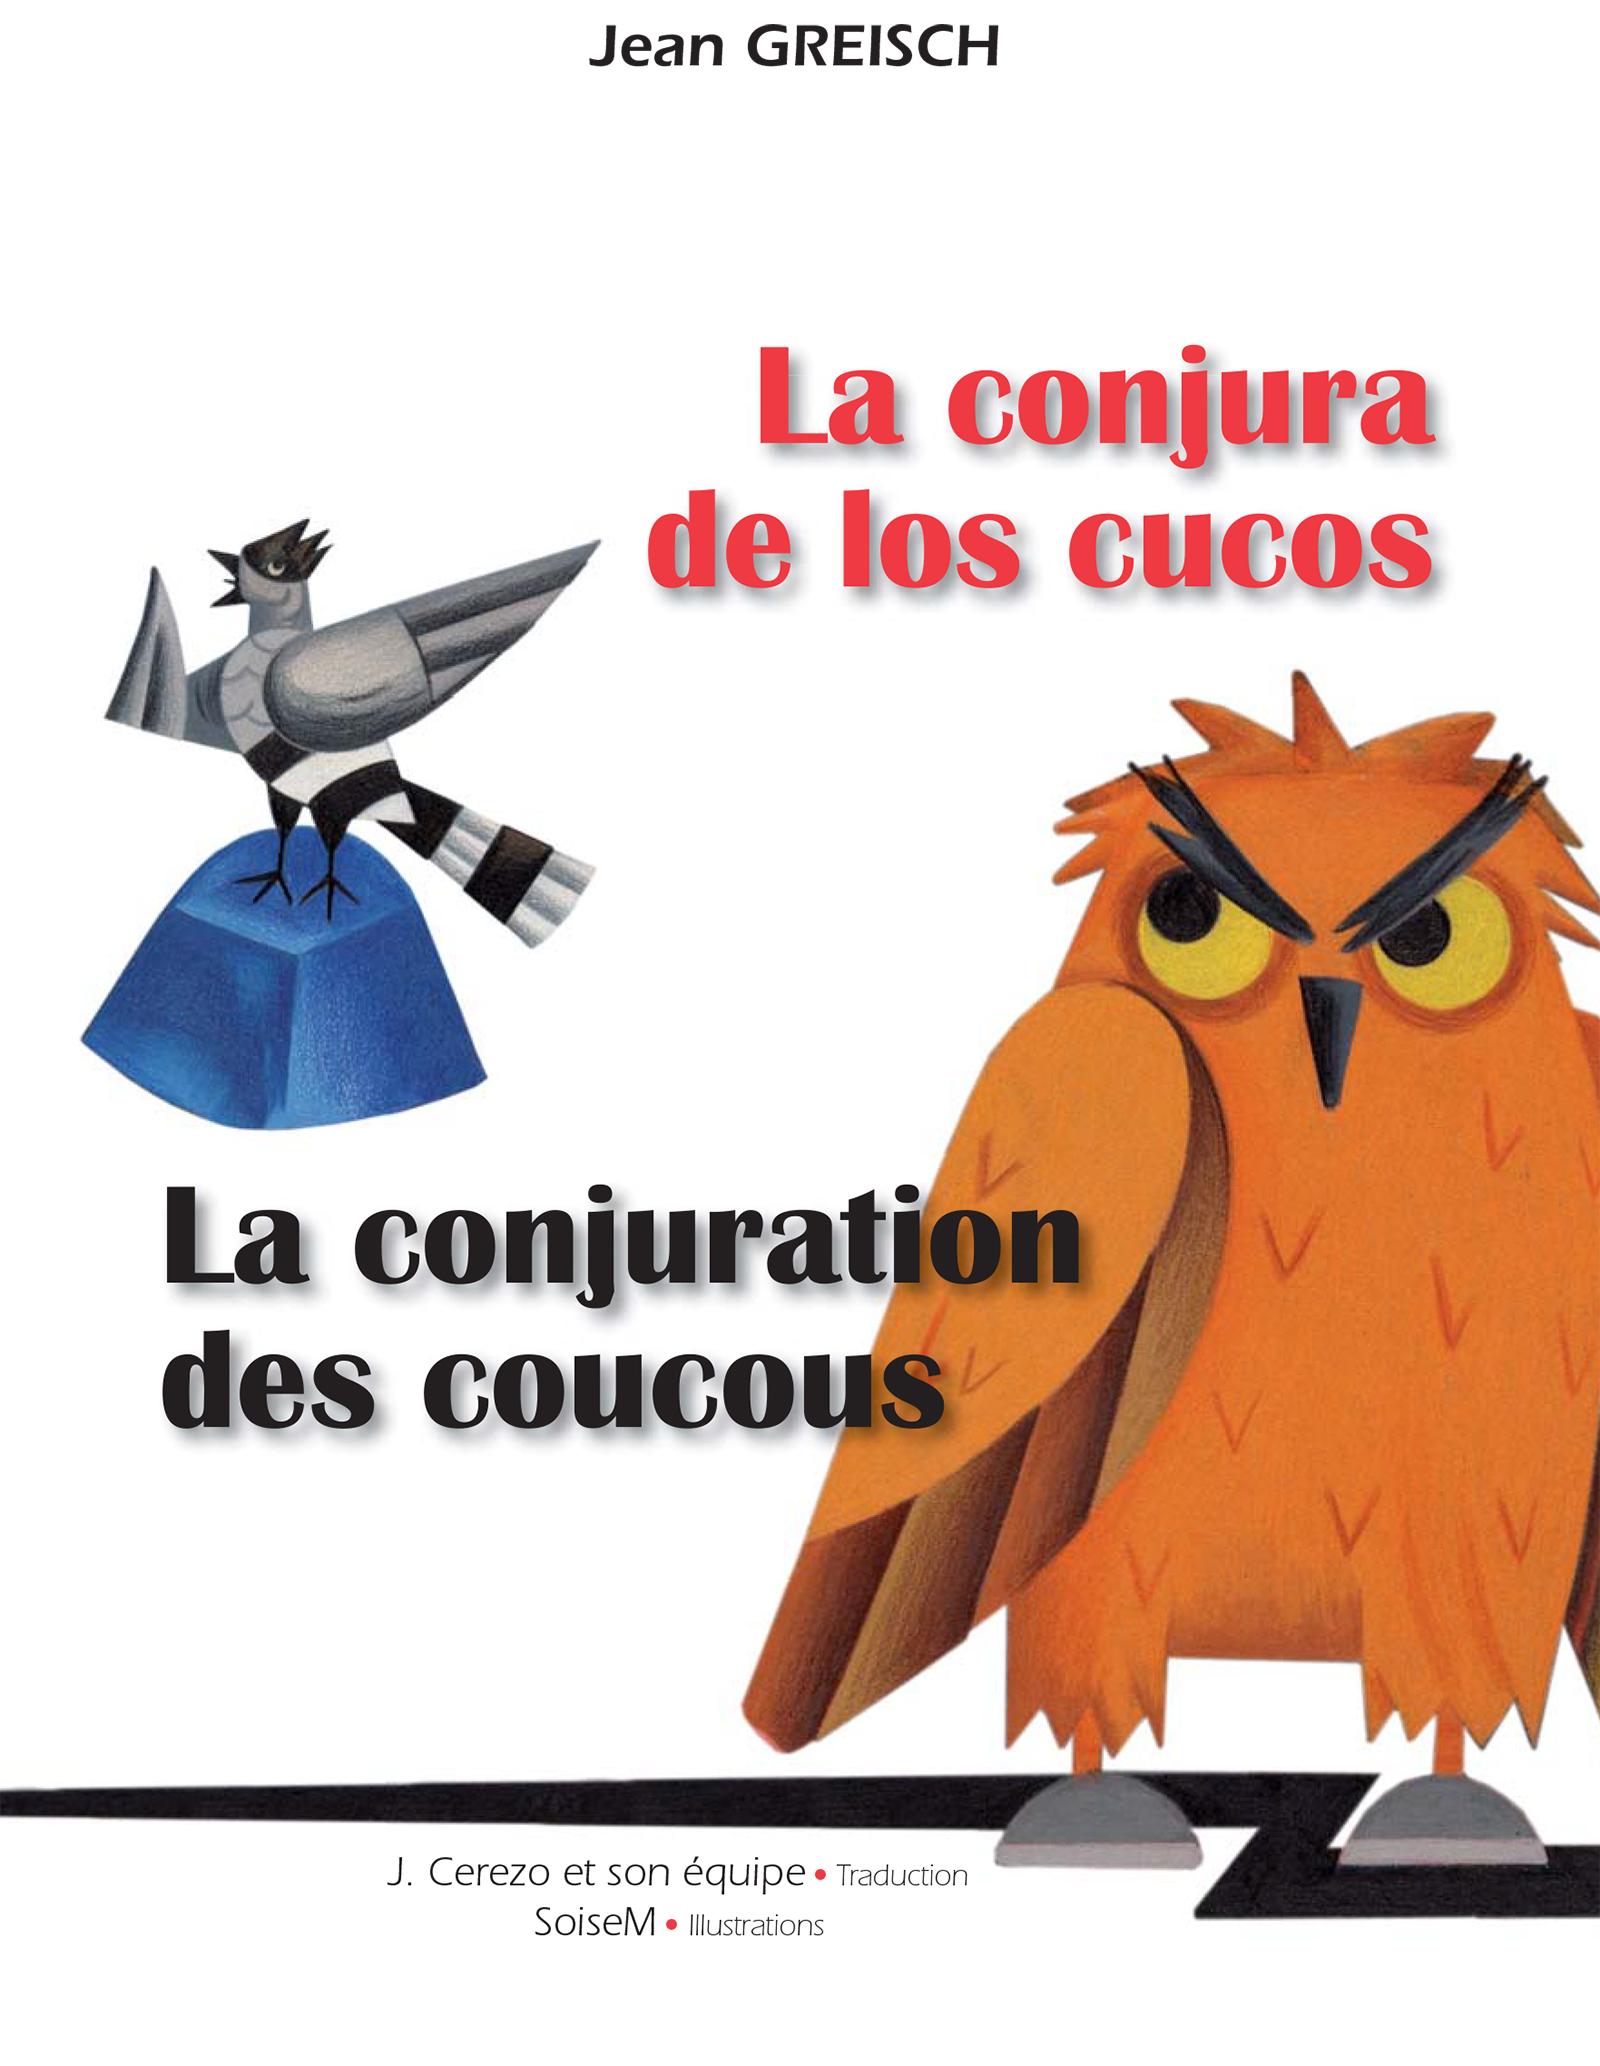 La conjura de los cucos : La conjuration des coucous, Conte philosophique bilingue français - espagnol